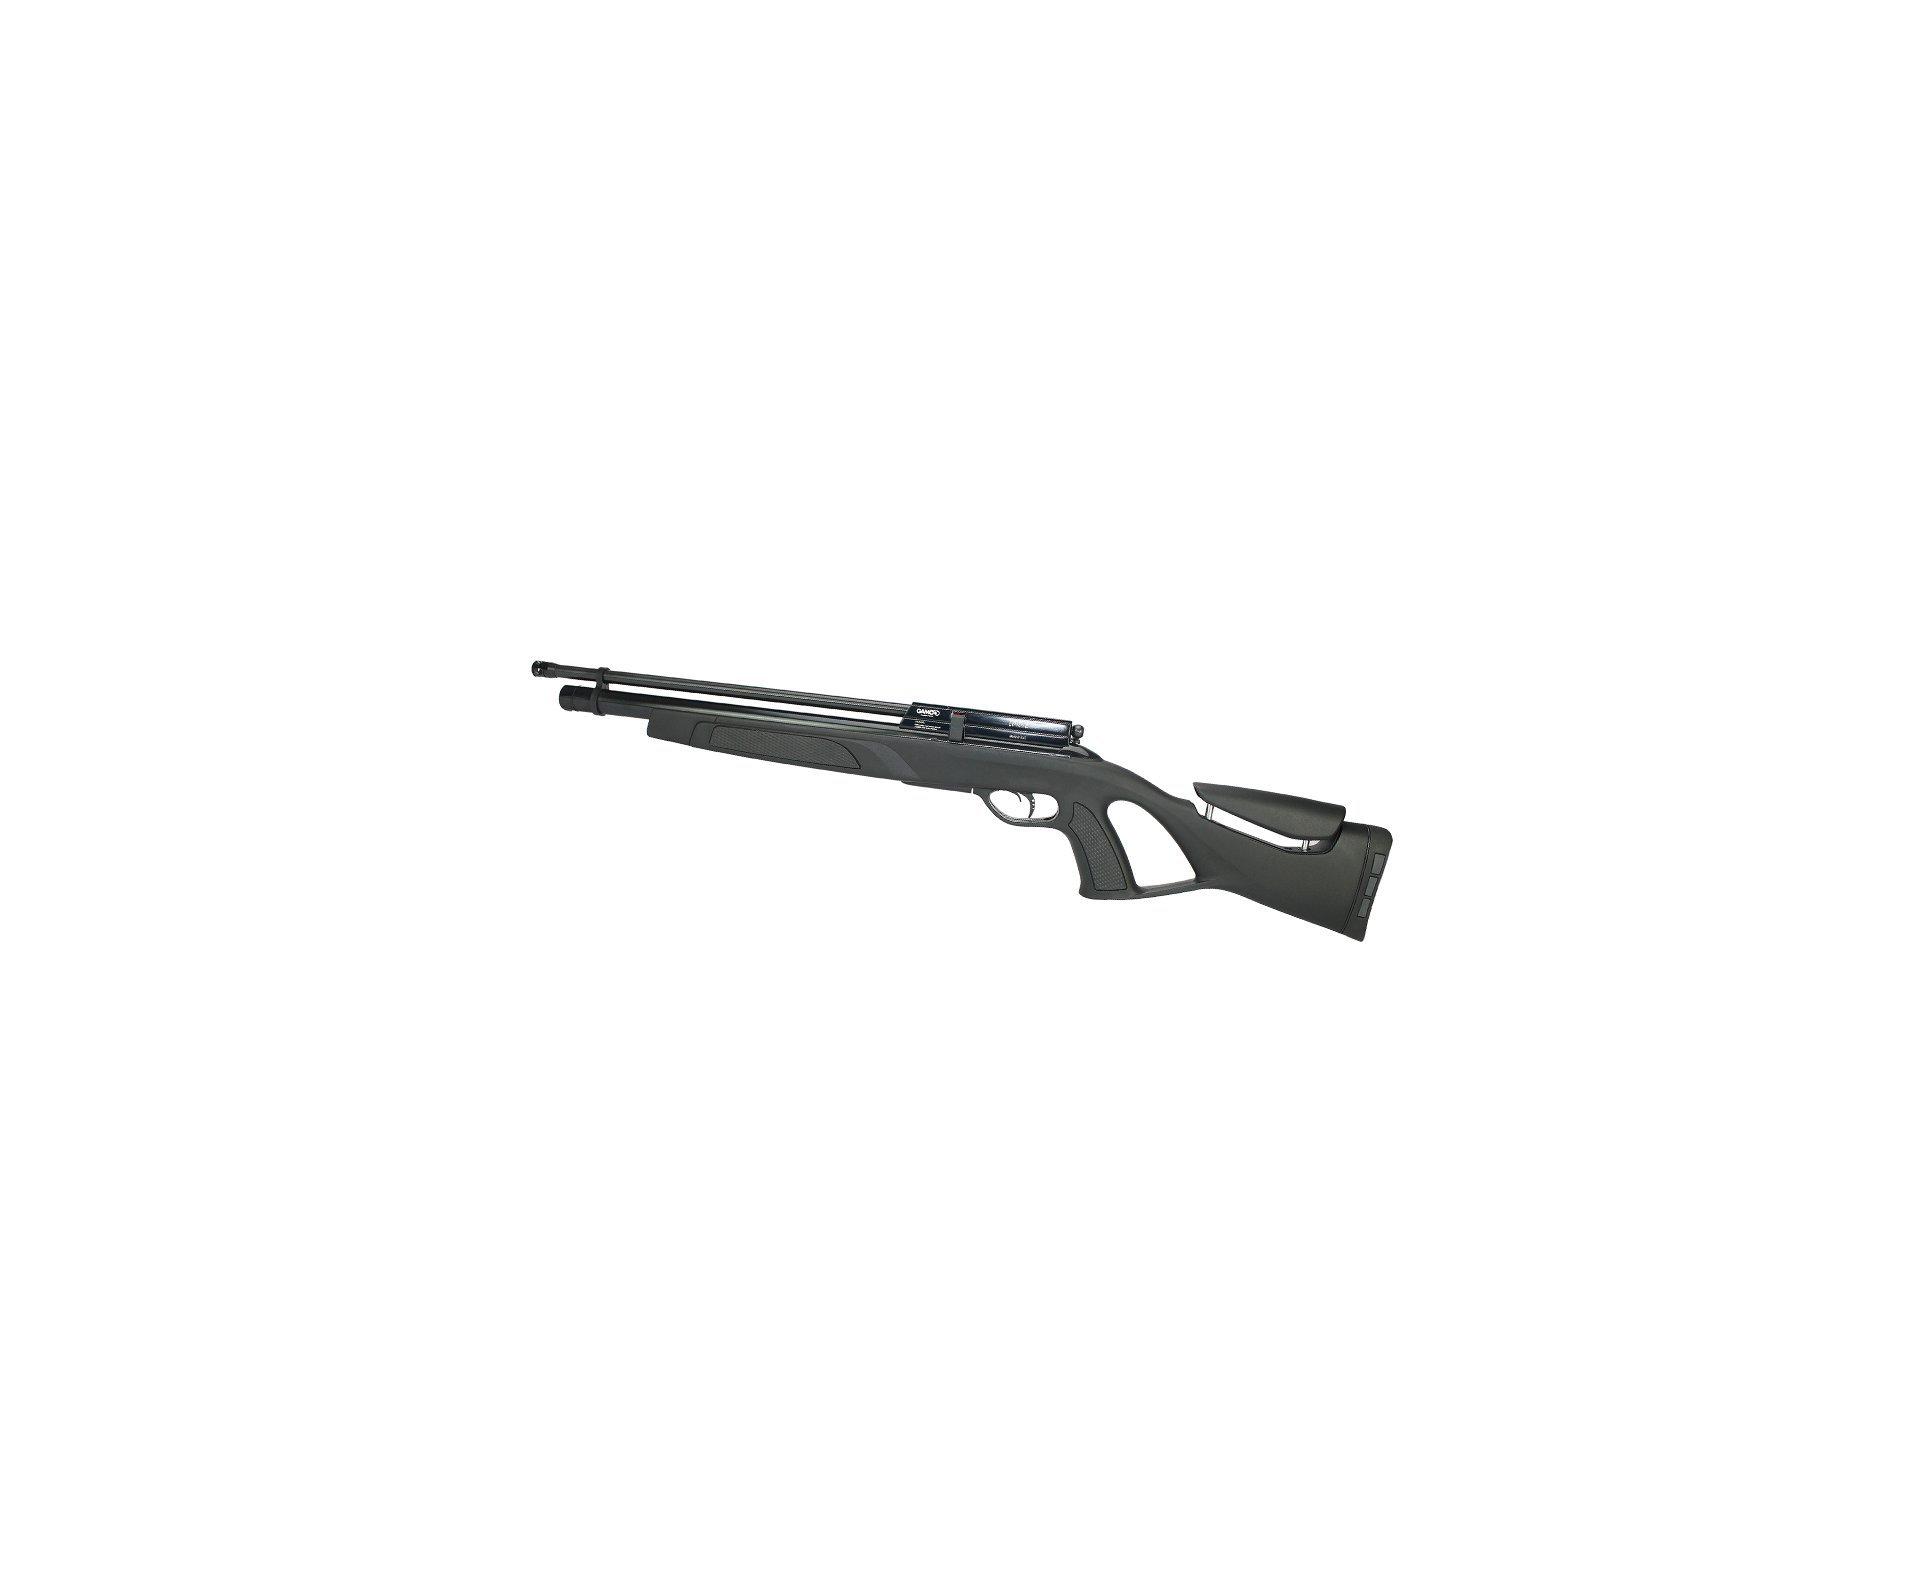 Carabina Pcp Gamo Coyote Black Cal 5,5mm + Luneta 4x34 Gold Crow Rossi - Gamo